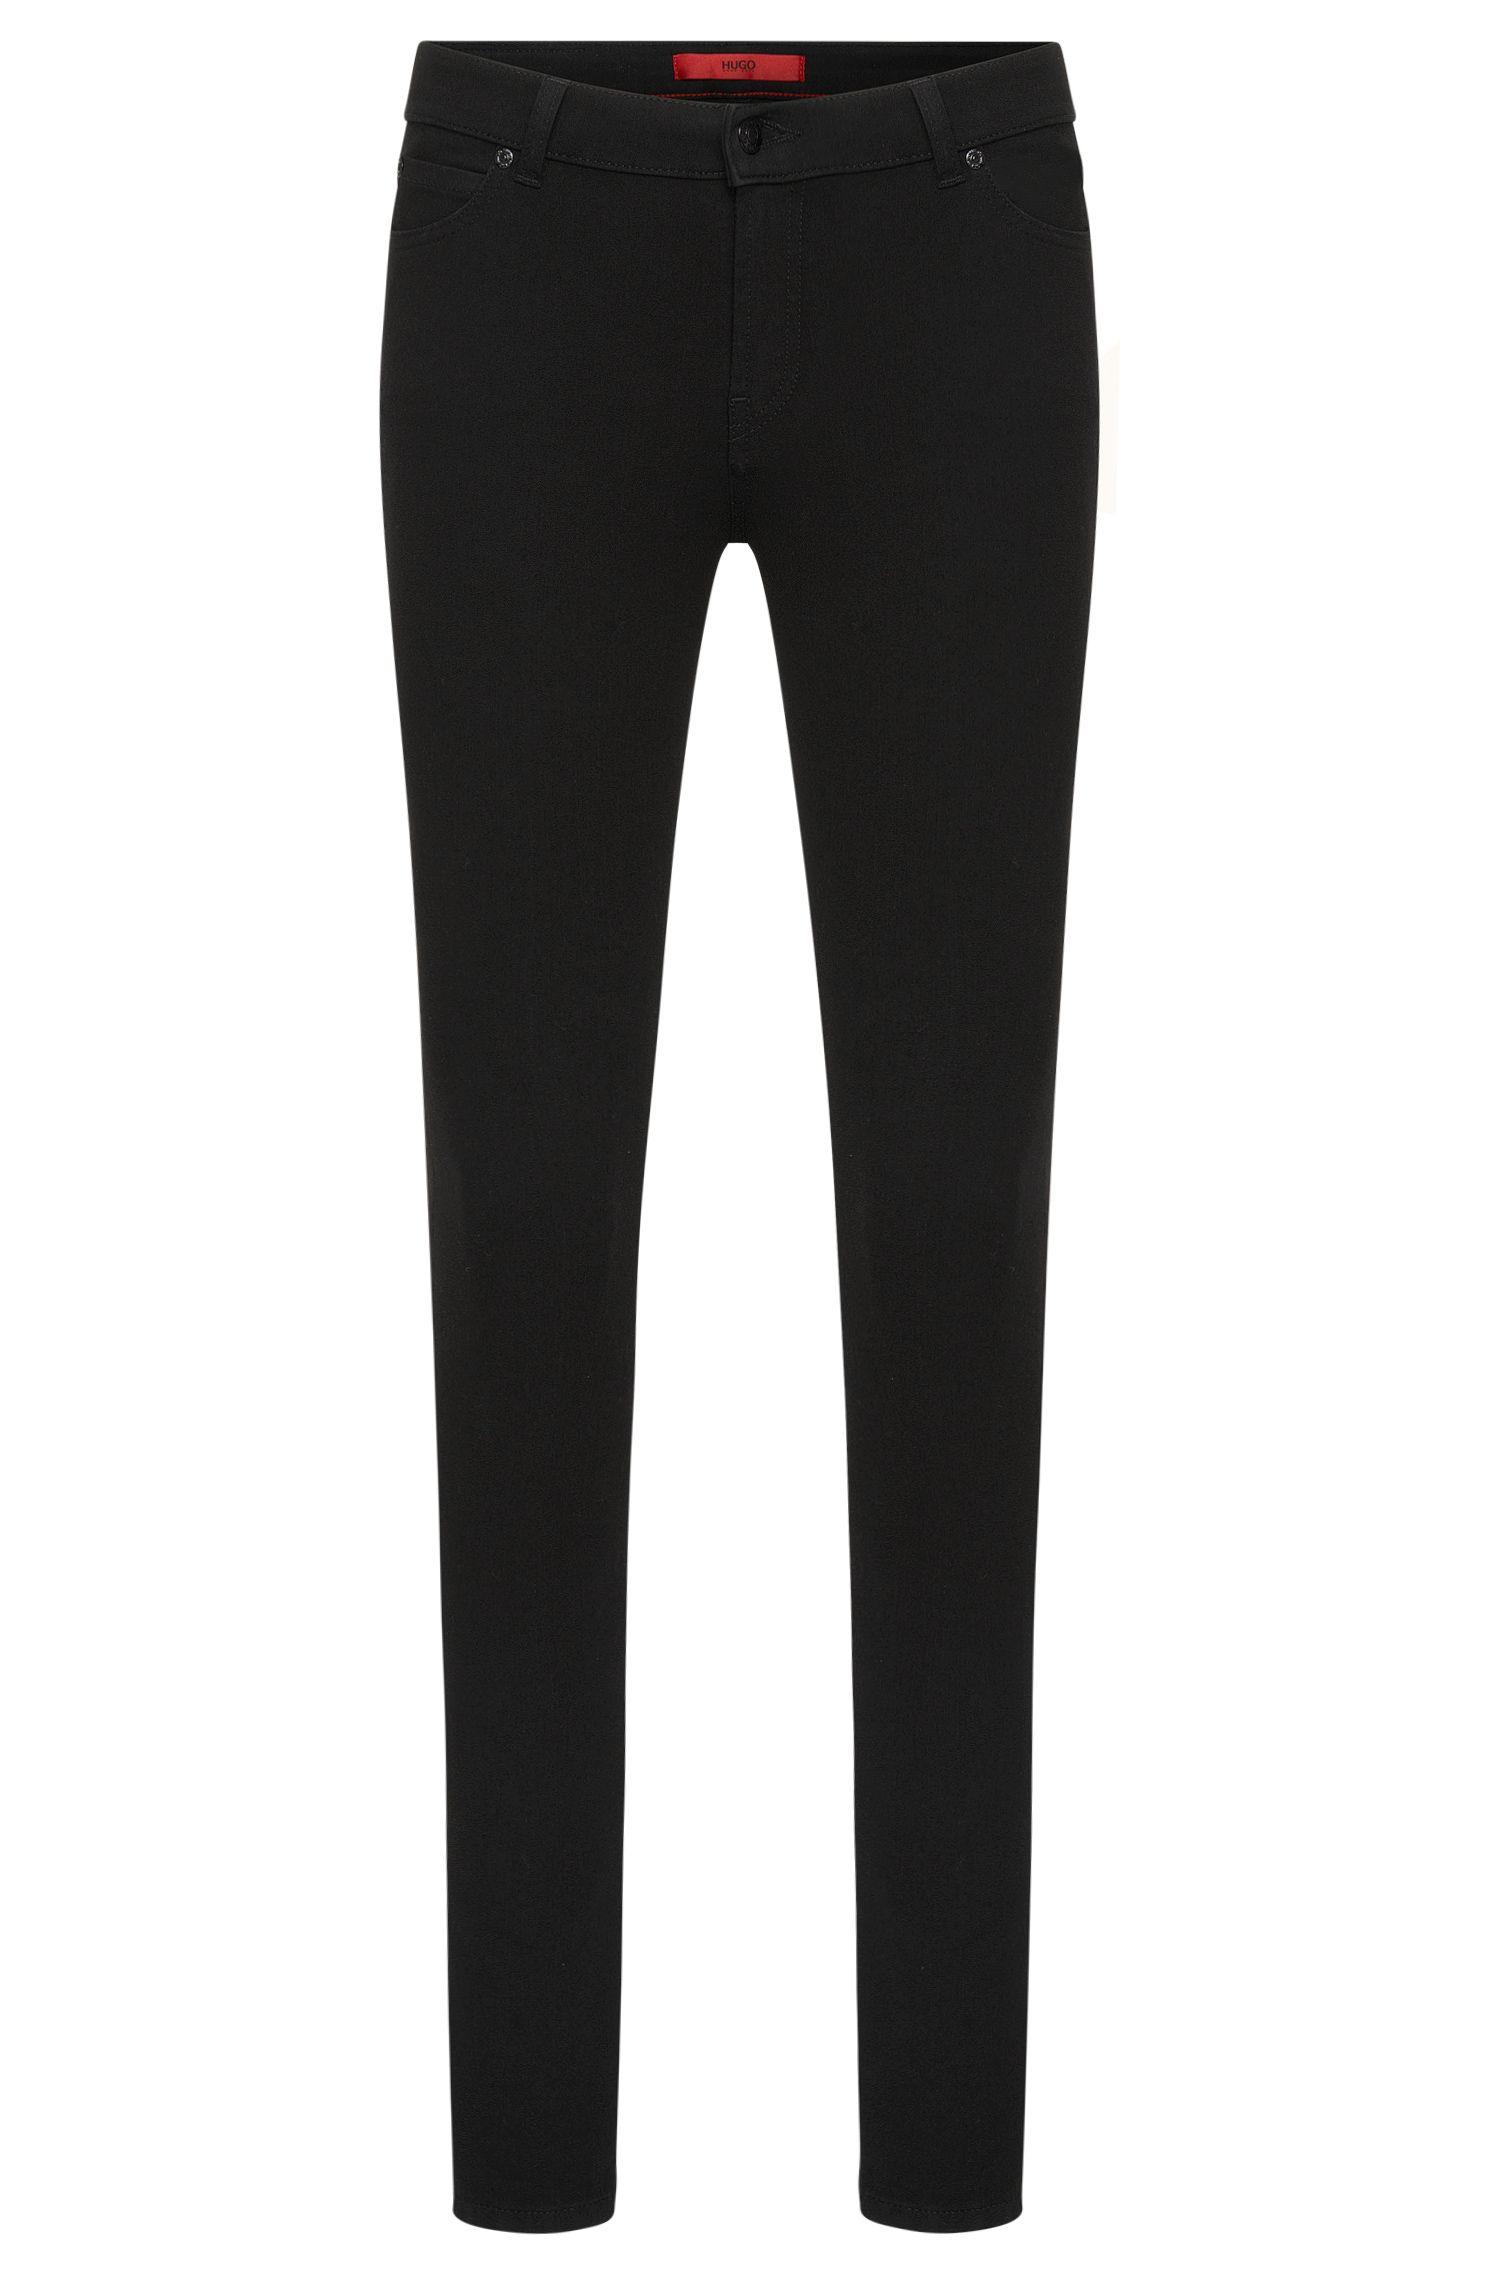 'Georgina' | Stretch Cotton Blend Mid-Rise Skinny Jeans